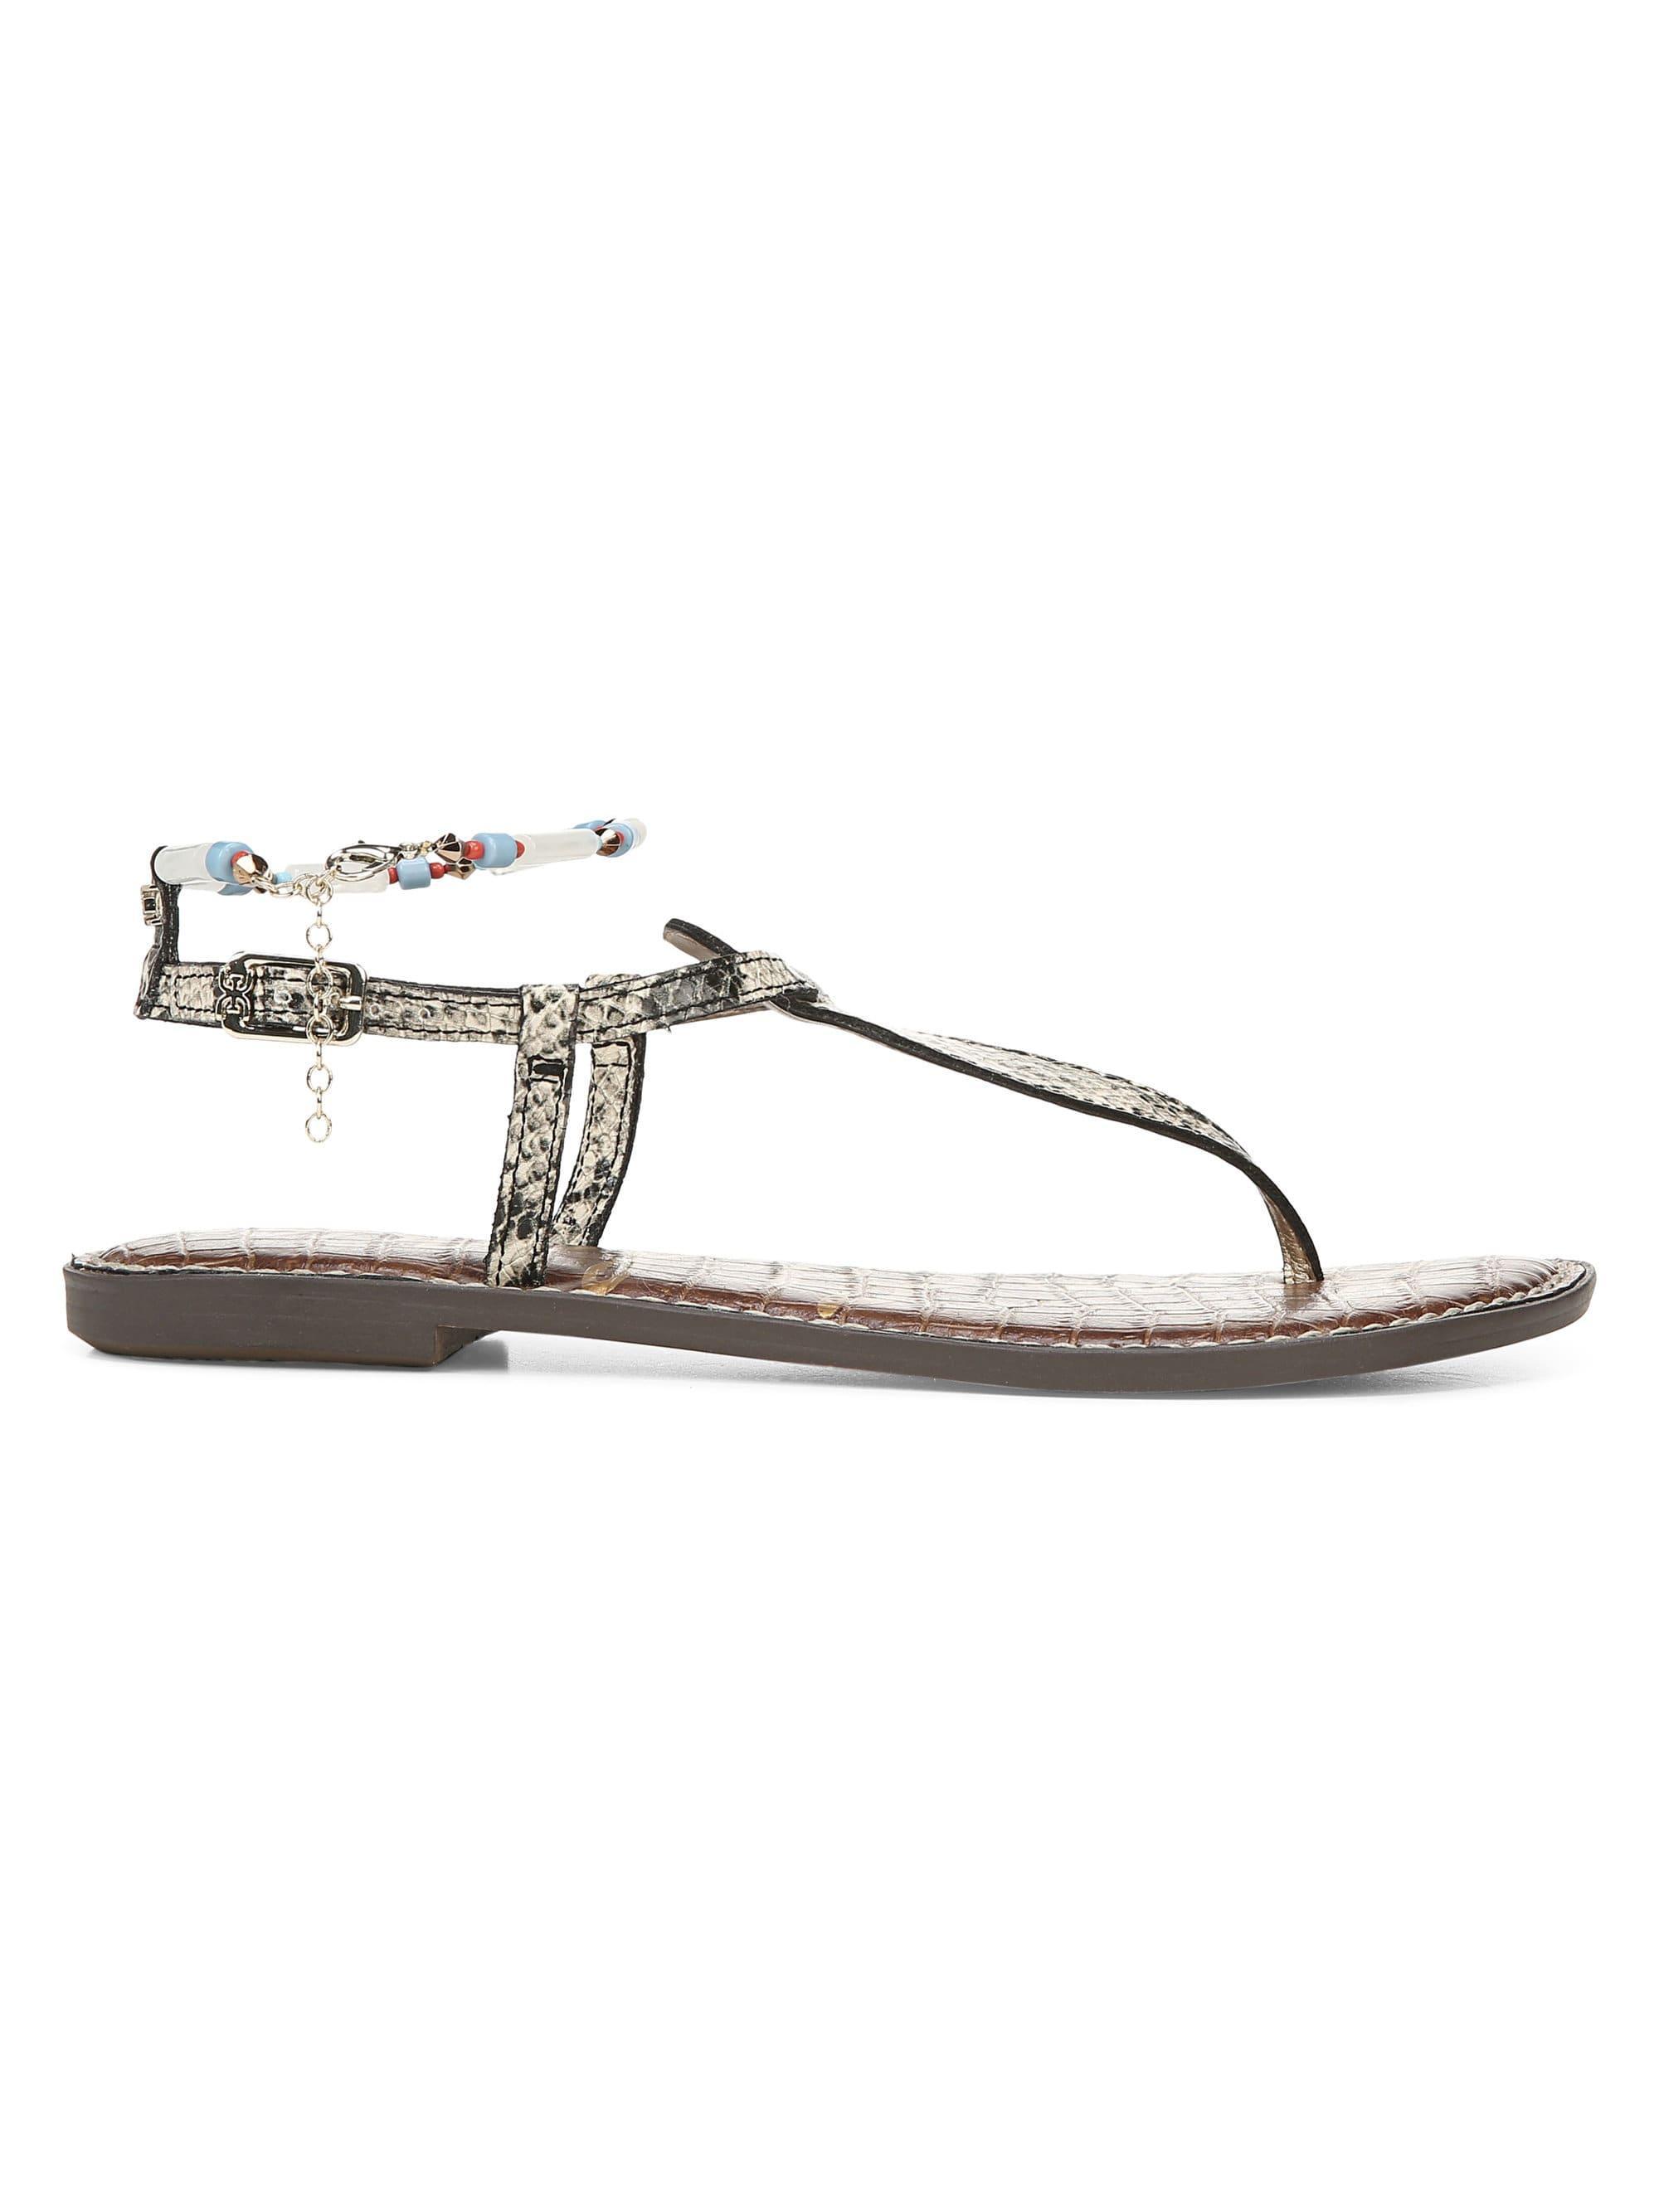 5197f9aad Lyst - Sam Edelman Geena Snake Print Leather Gladiator Sandals in White